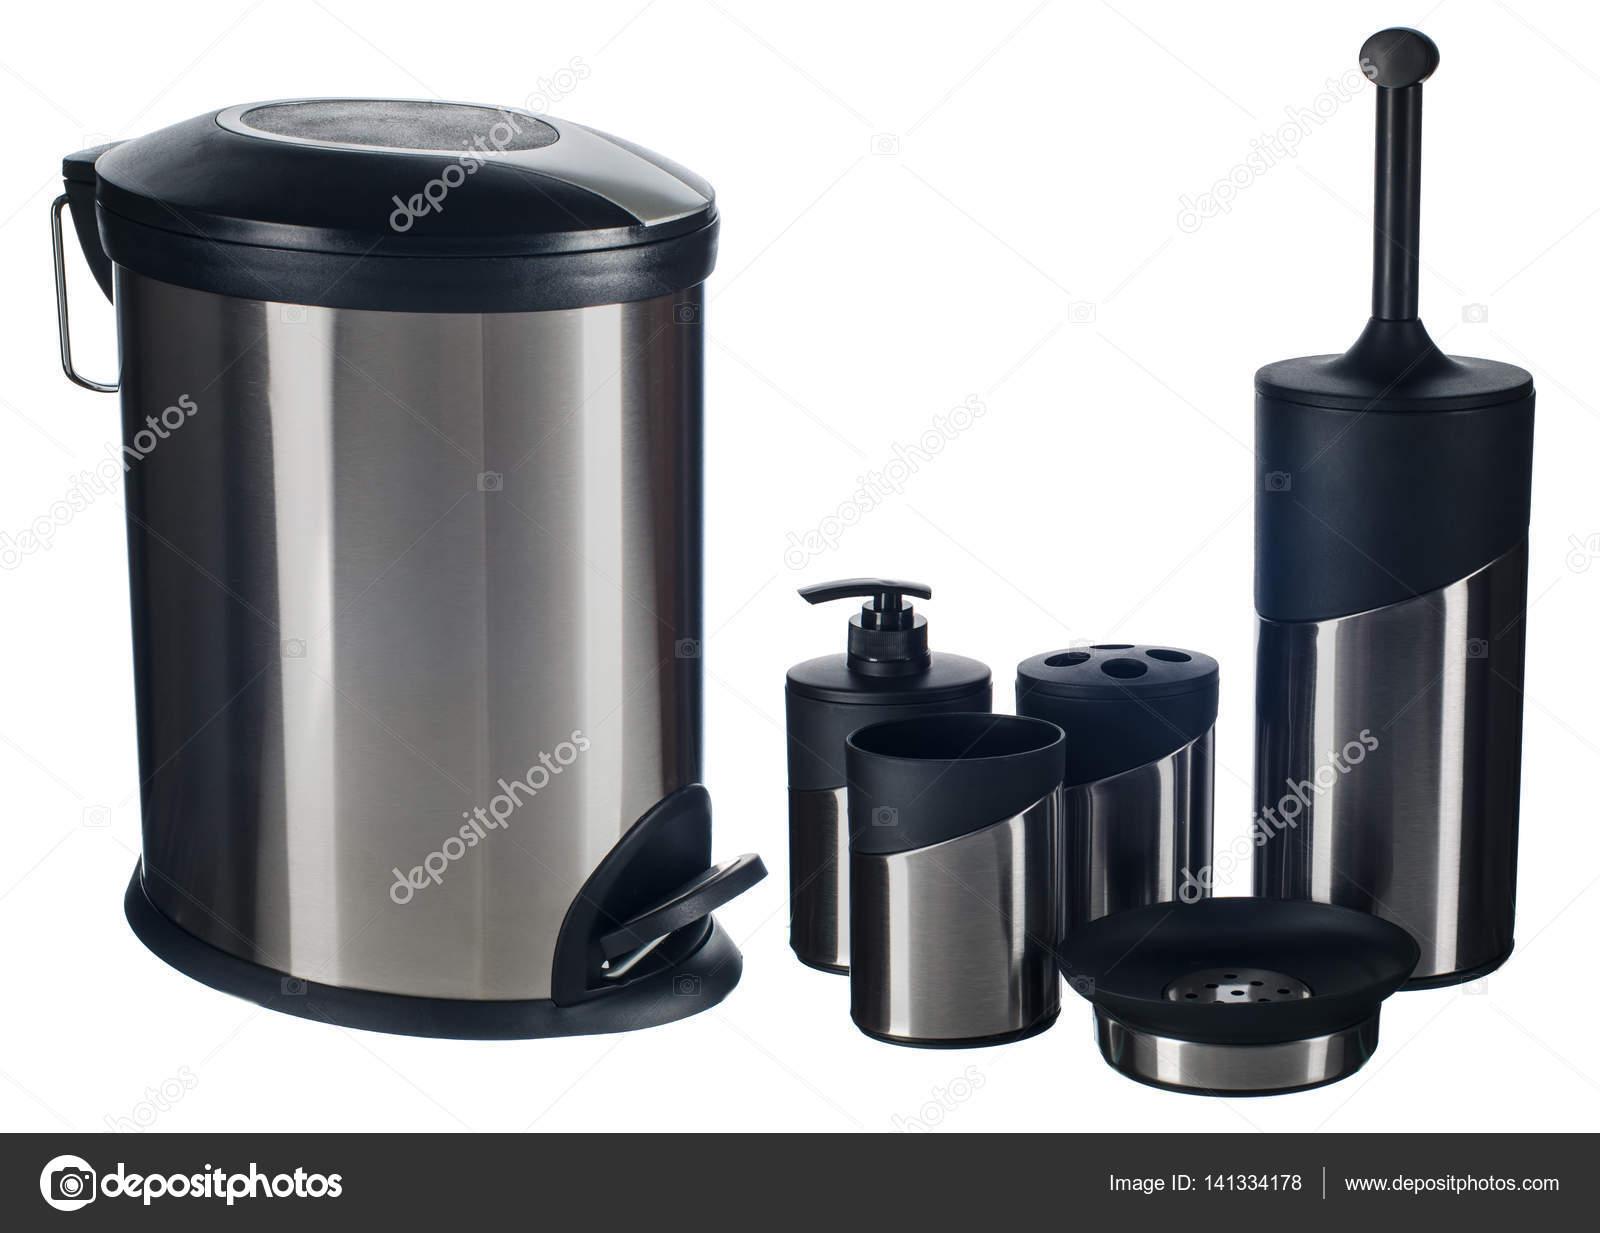 Set di accessori bagno in acciaio inox u2014 foto stock © am wolna